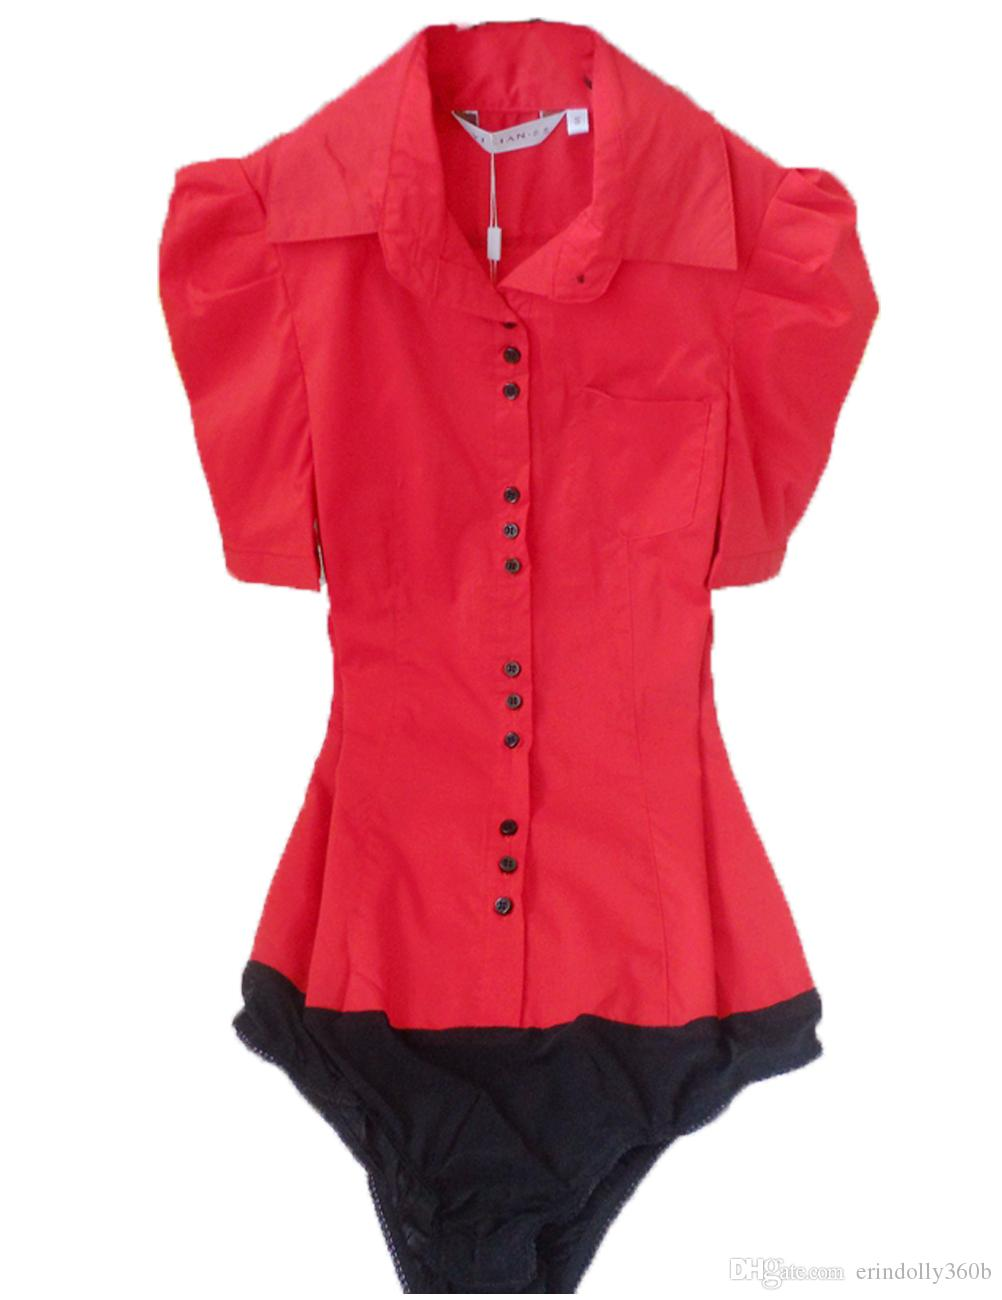 82de41dacda89 2019 Plus Size 2017 Women Fashion Summer Style Short Sleeve OL Formal Body  Shirt Button Ladies Blouse Work Wear White Red Blue S XXXL From  Erindolly360b